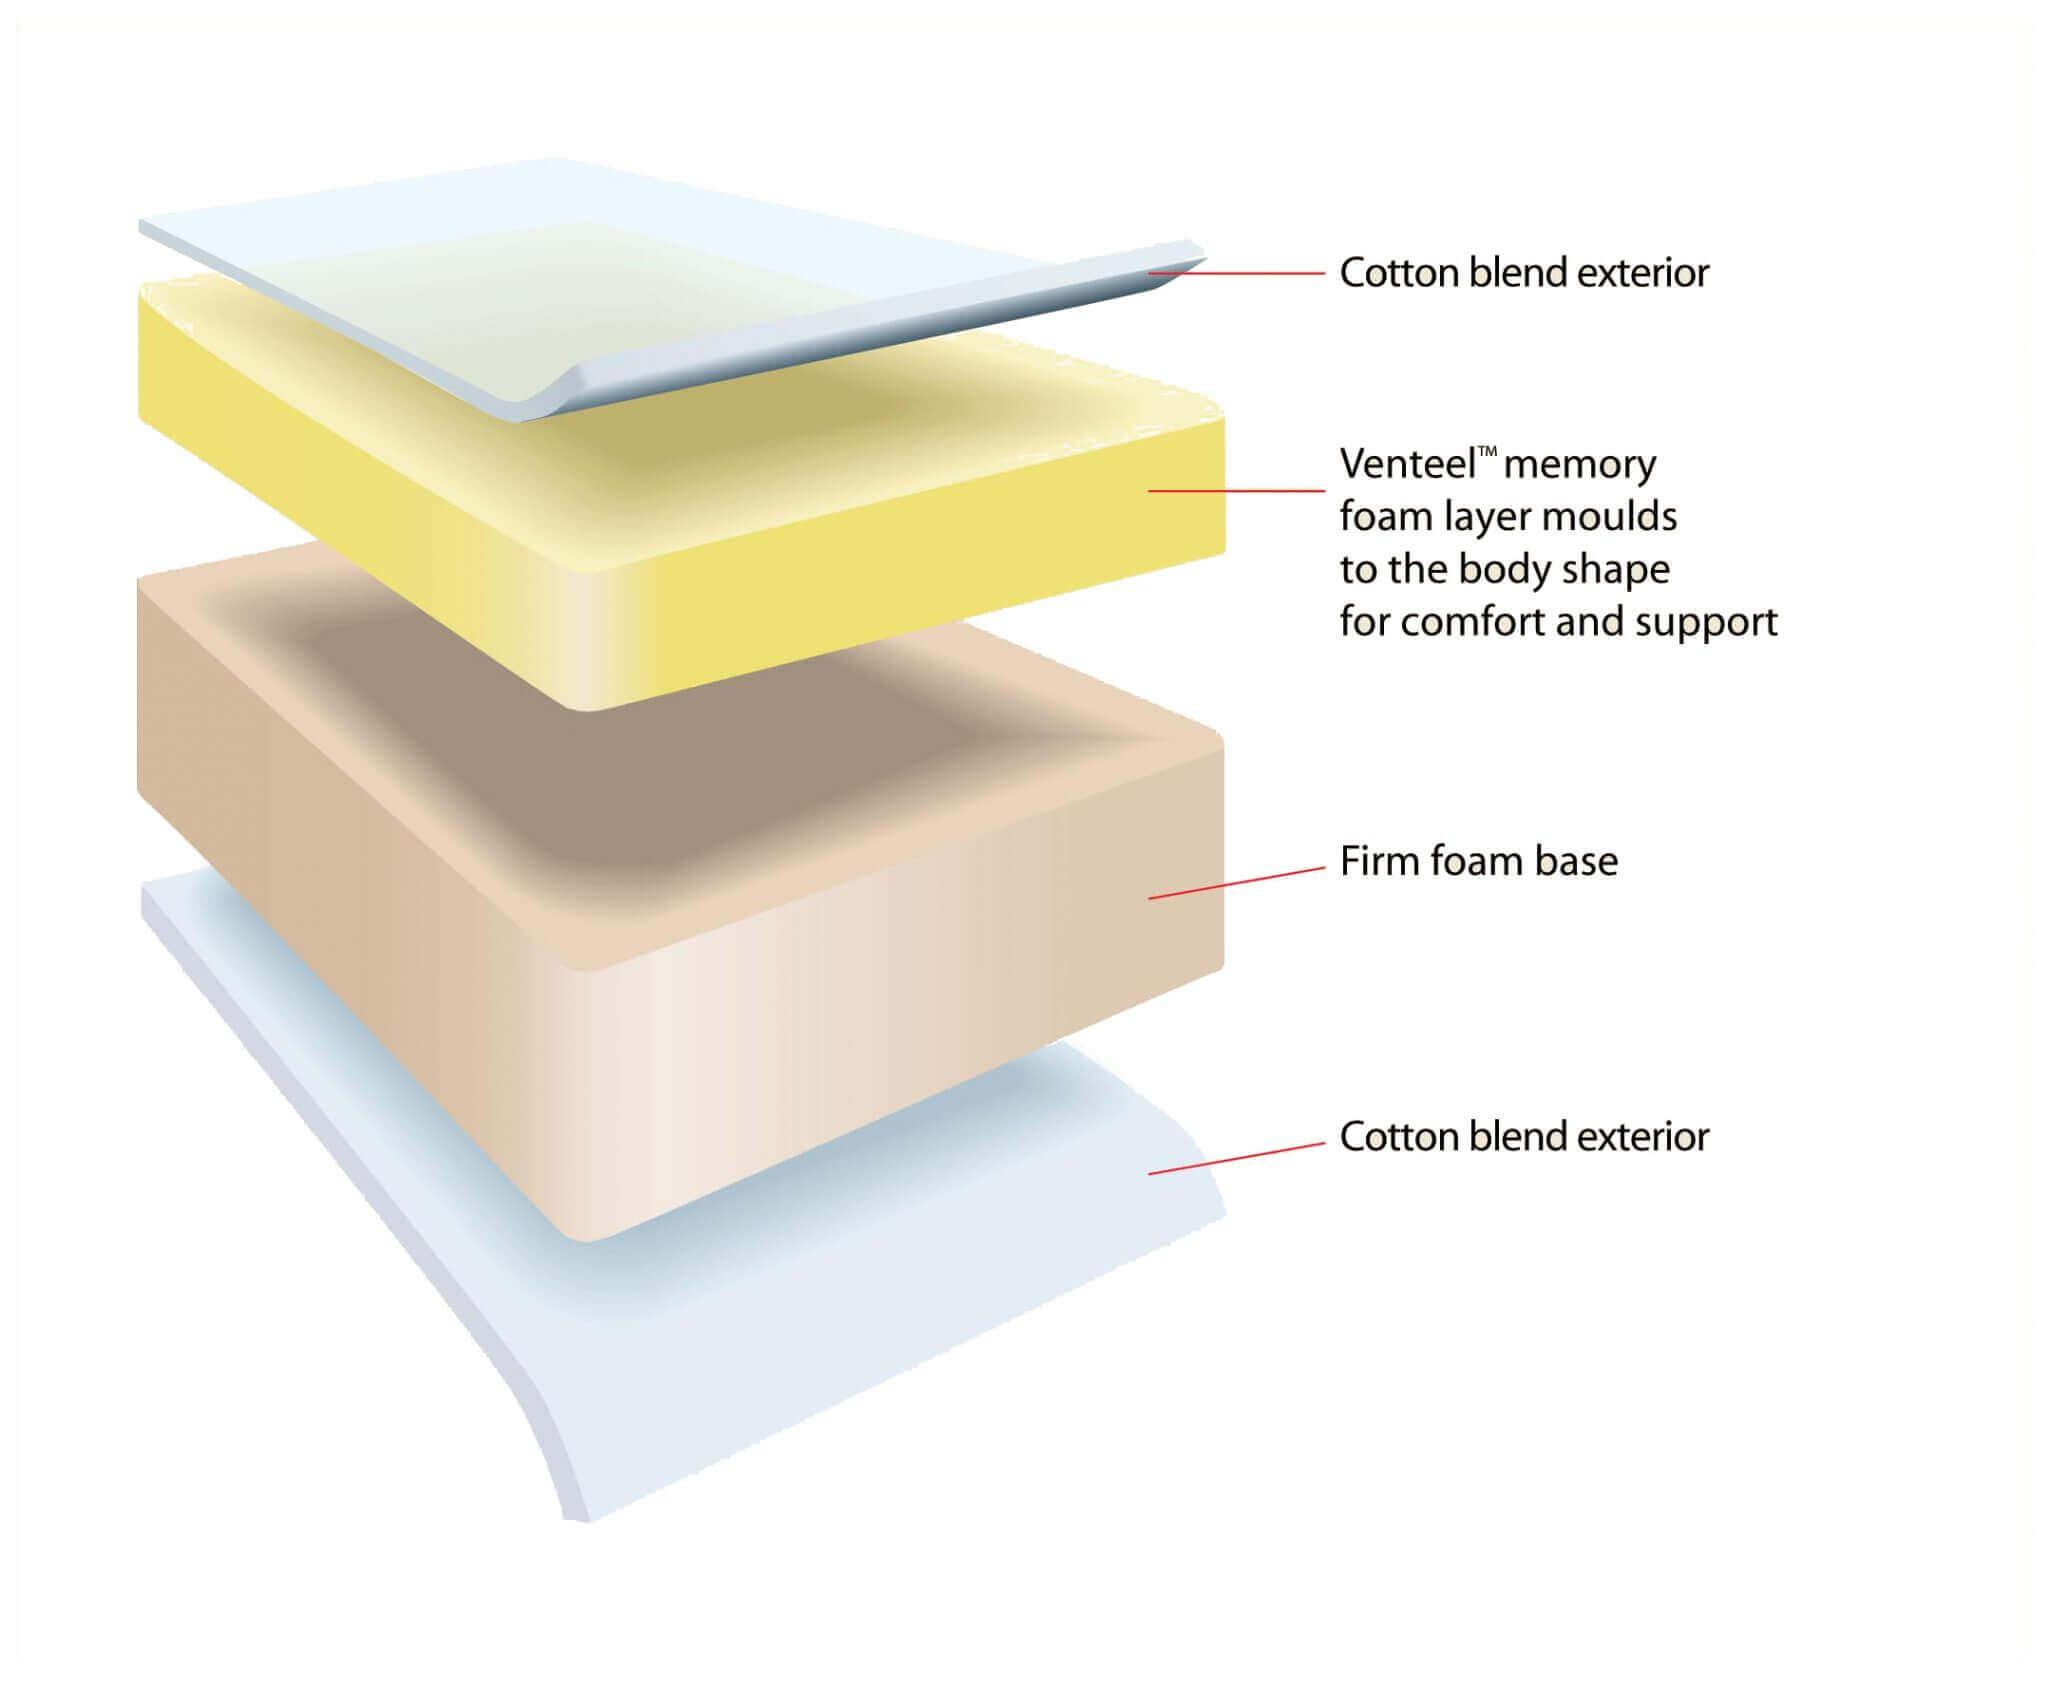 Structure-of-Windsor-Memory-Foam-Mattress-tpng.jpg